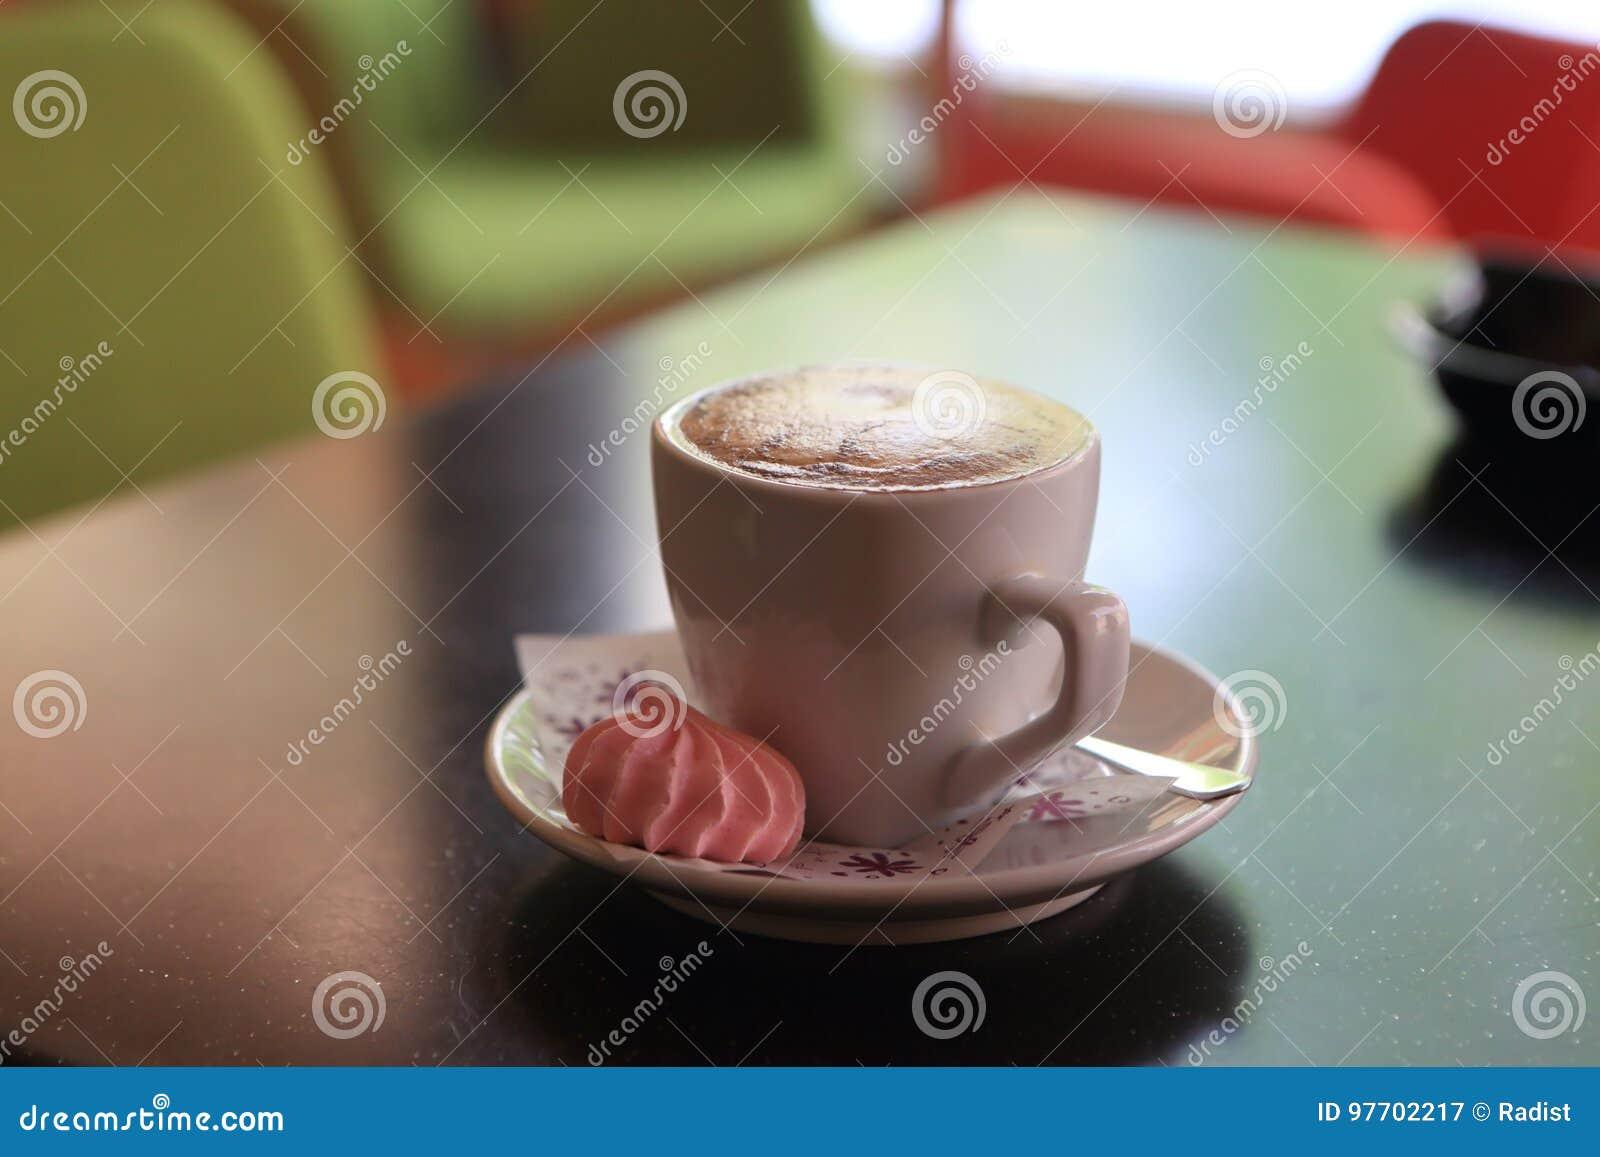 Coffee with meringue